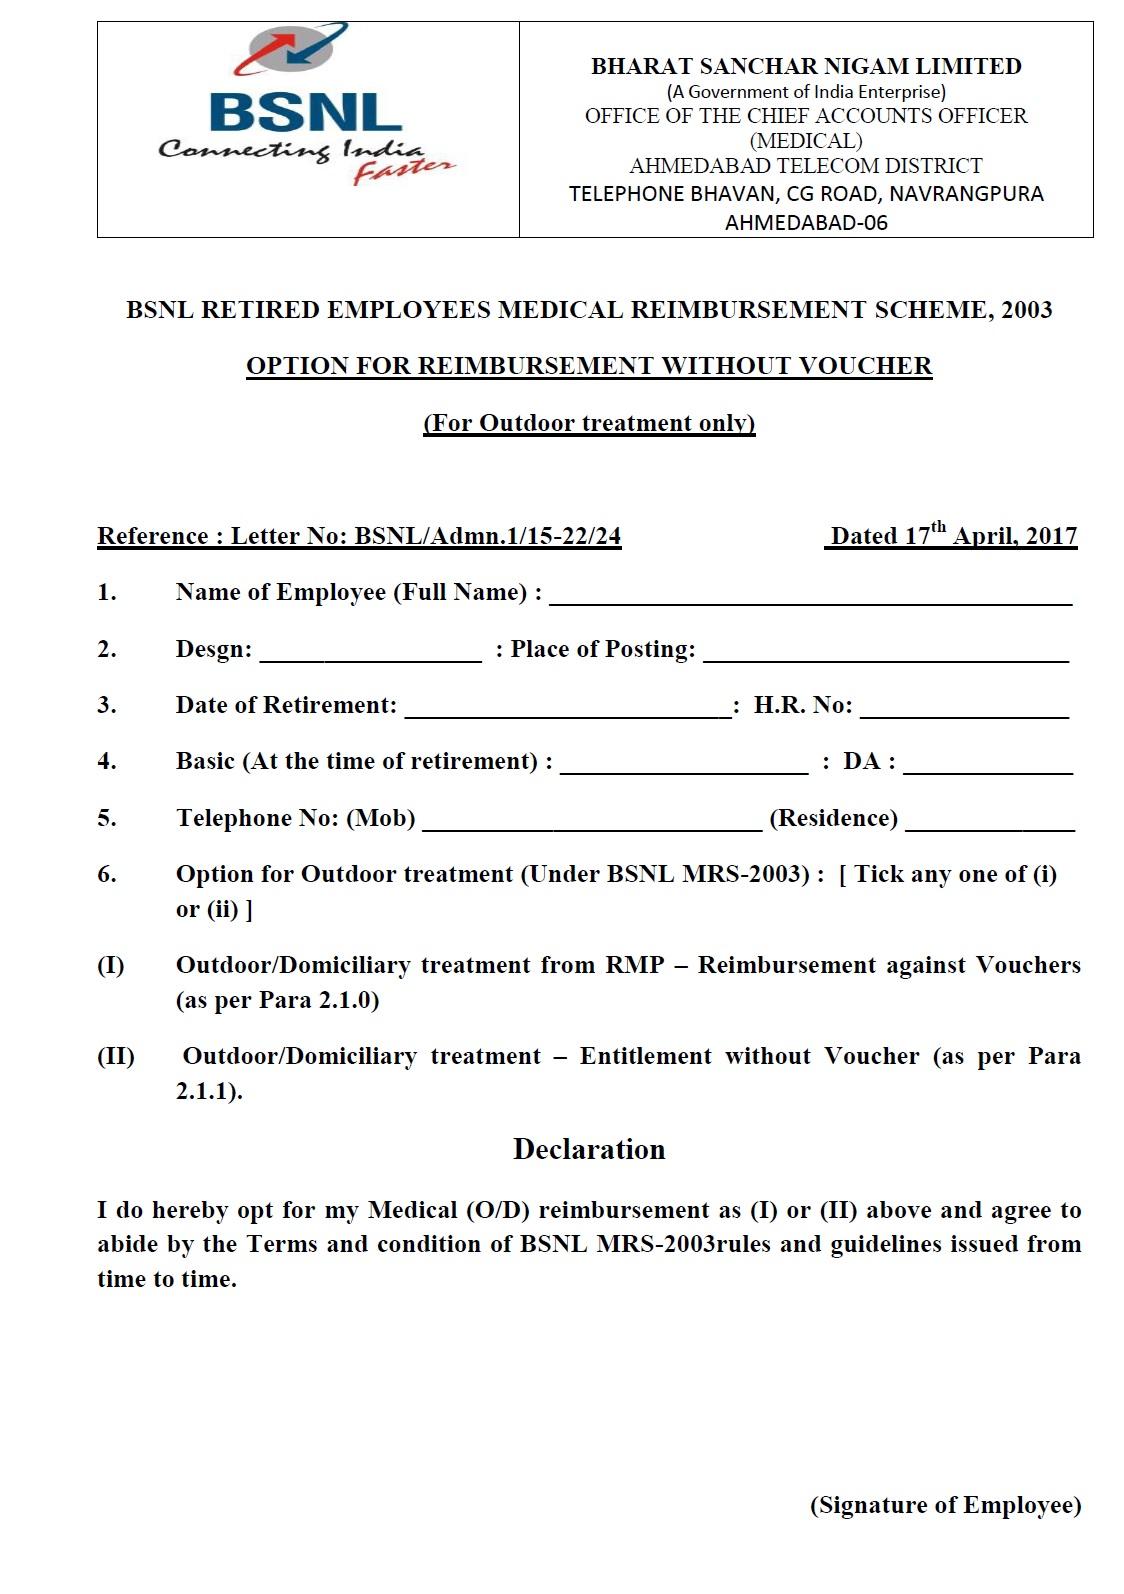 BSNL Pensioners Medical Reimbursement without voucher facility ...